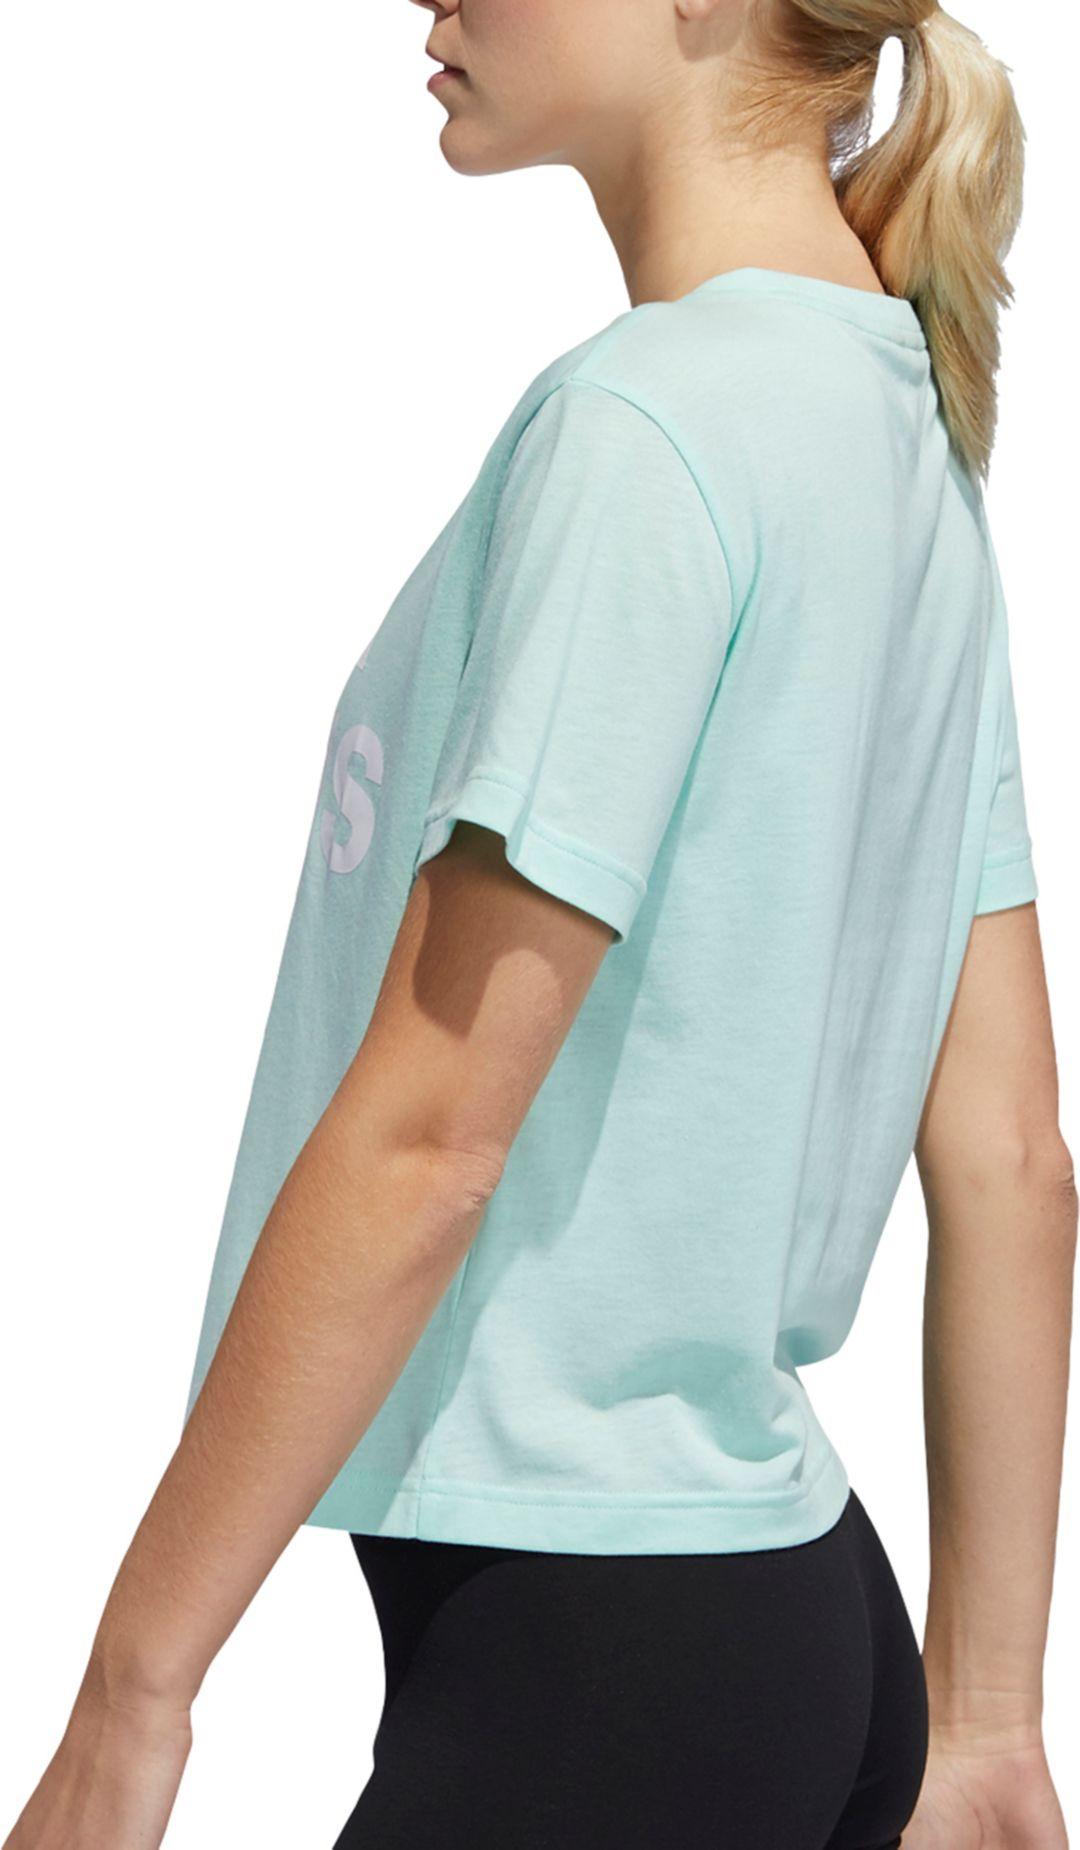 59d30c7896d8a adidas Women's Essentials Oversized Logo Graphic Cropped T-Shirt ...